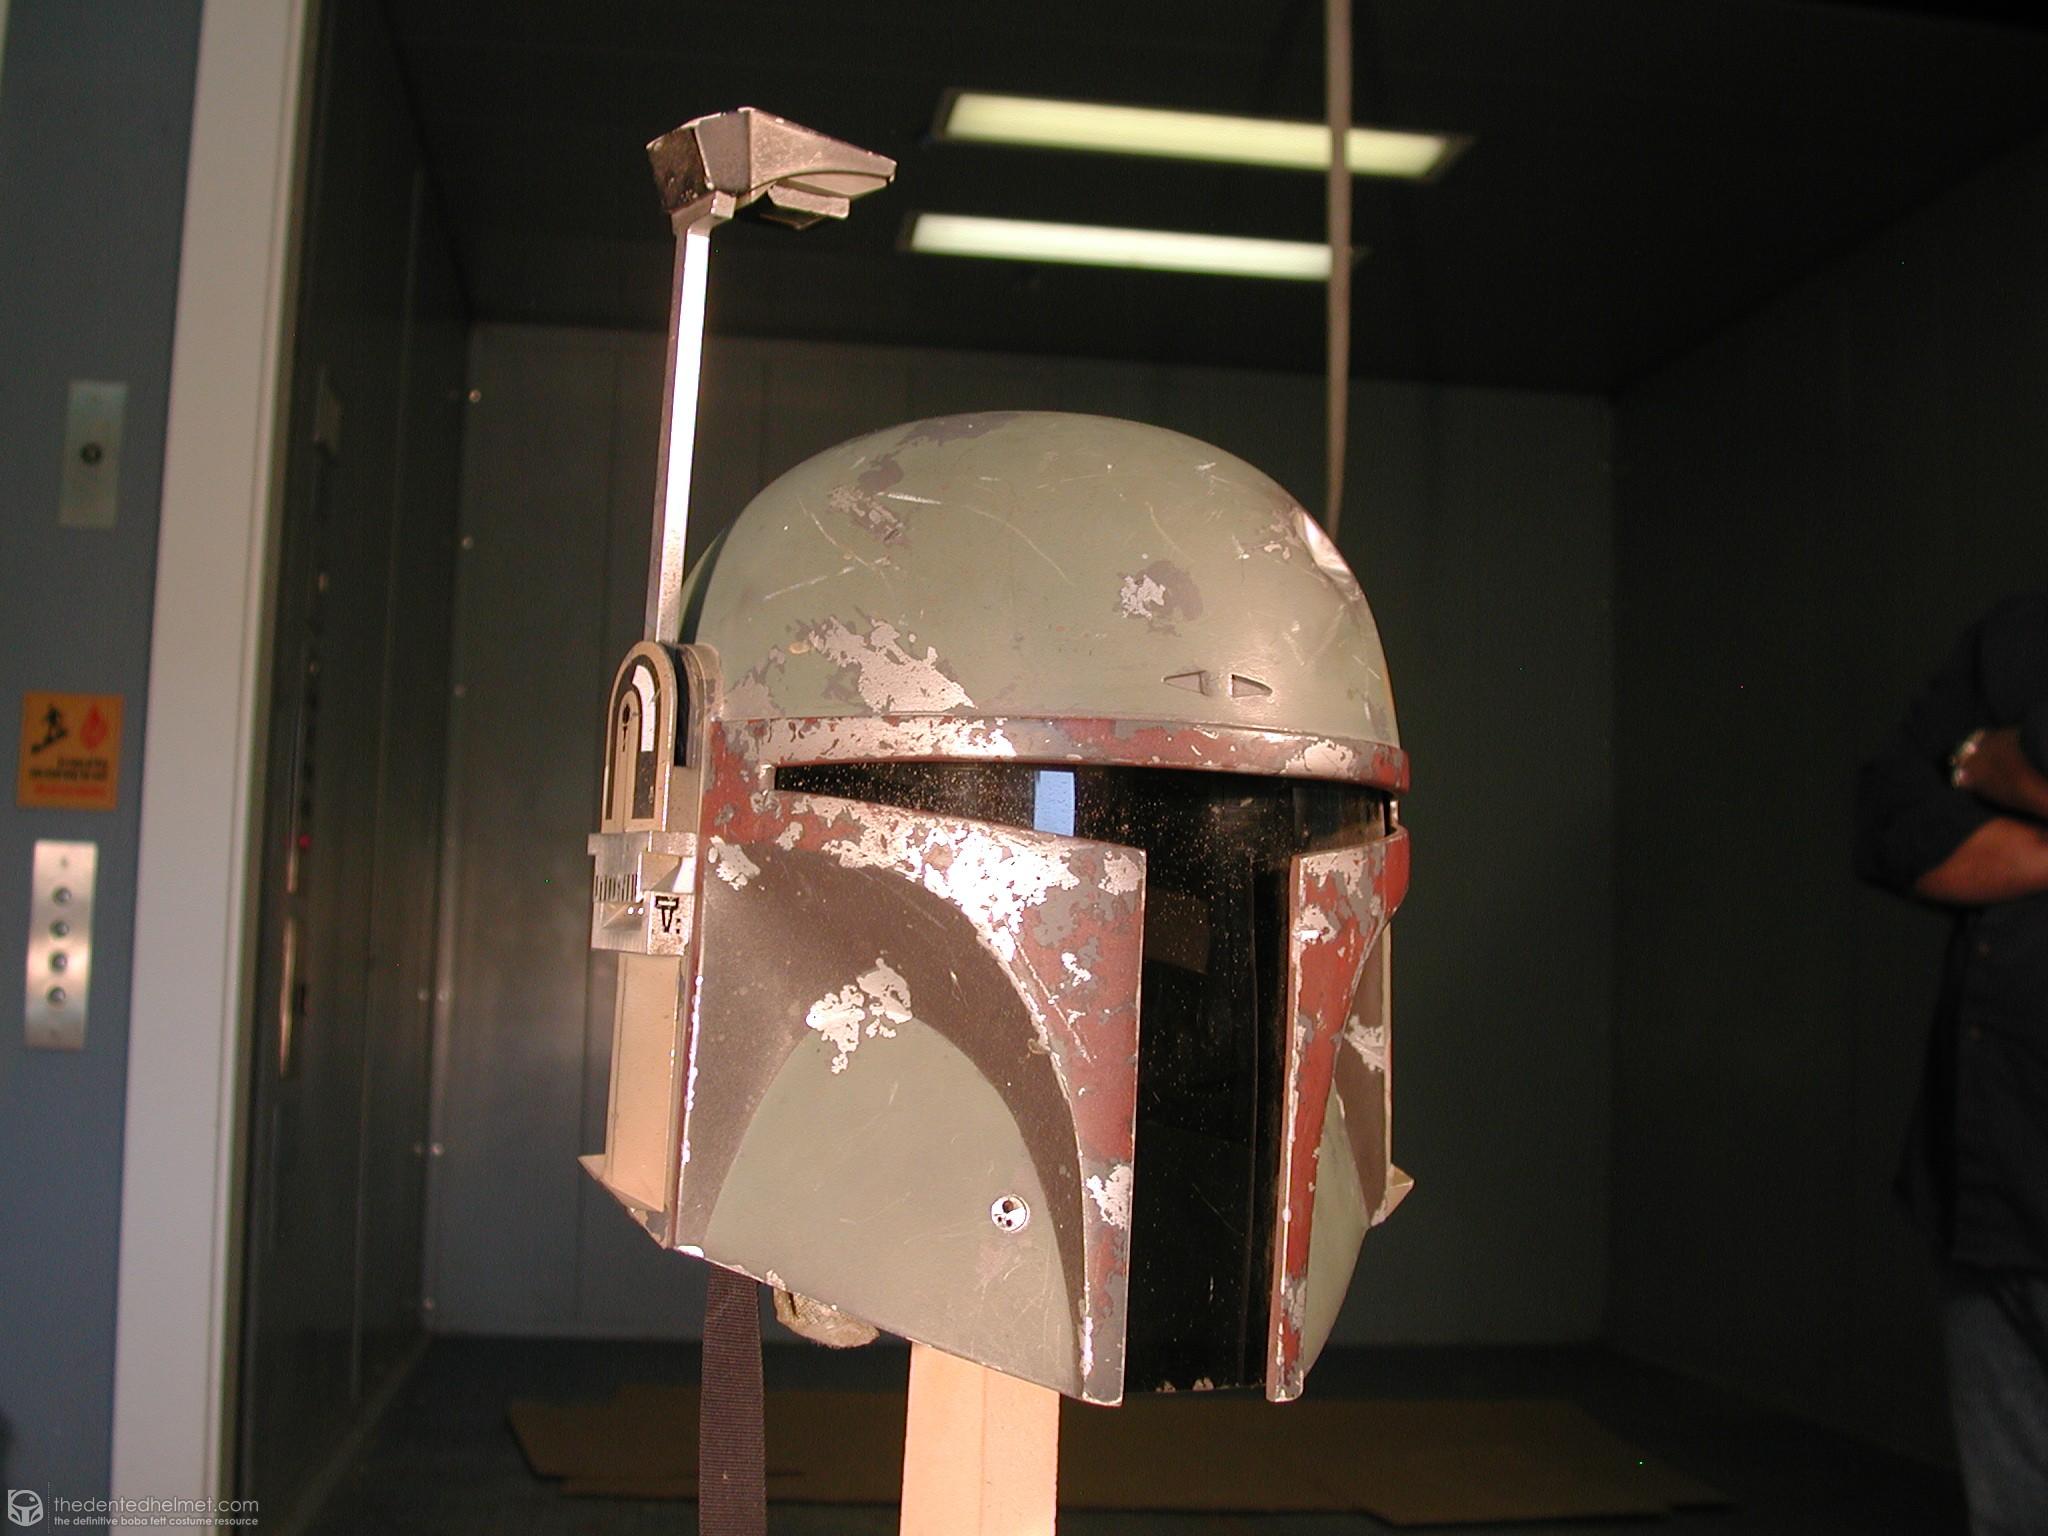 Boba-Fett-Third-Prototype-Helmet-095.jpg